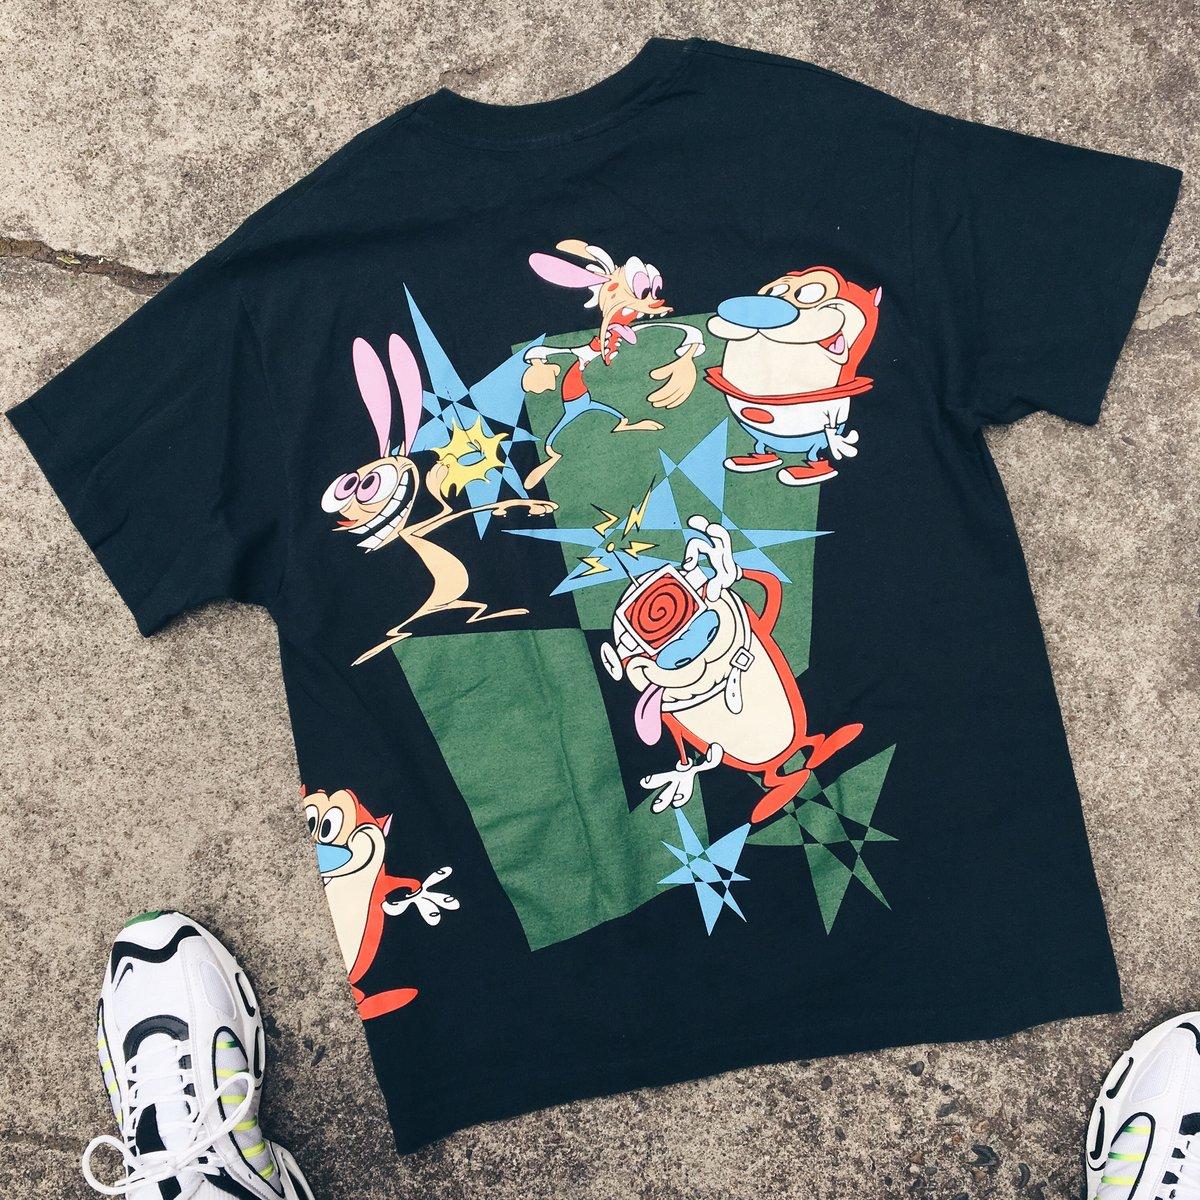 Image of Original 1992 Ren and Stimpy Nickelodeon Tee.